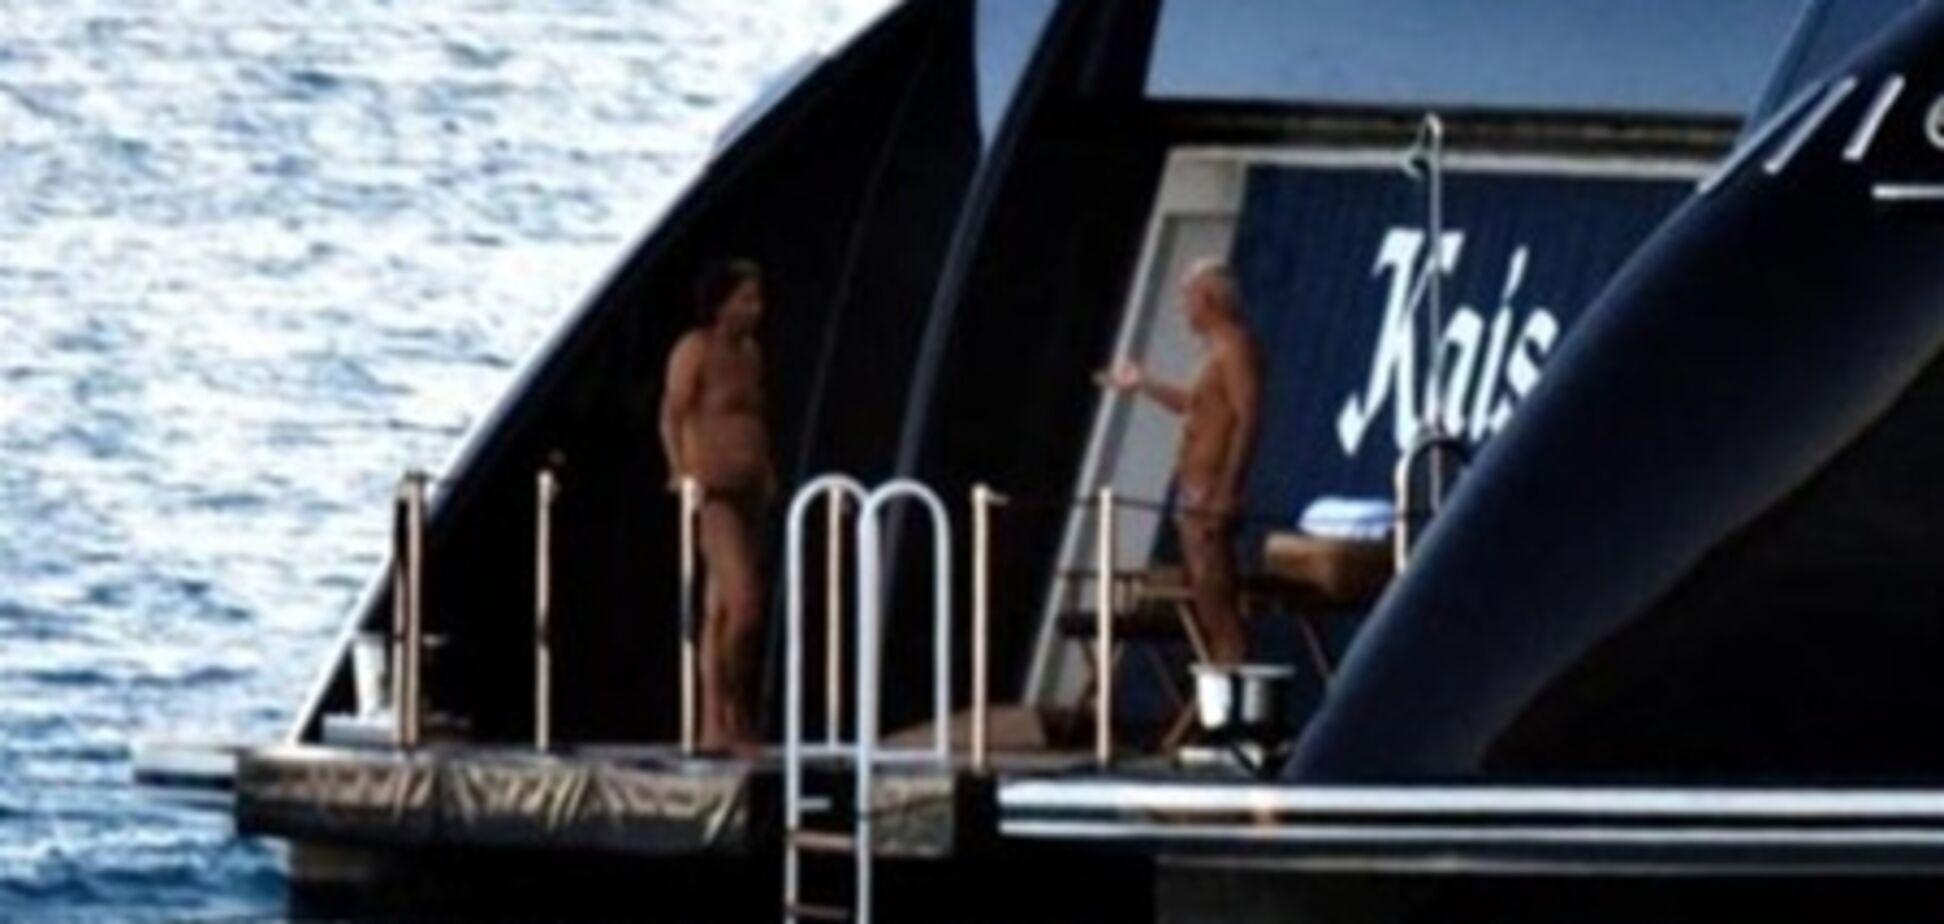 Экс-владелец 'Металлиста' Ярославский засветился в плавках. Фото